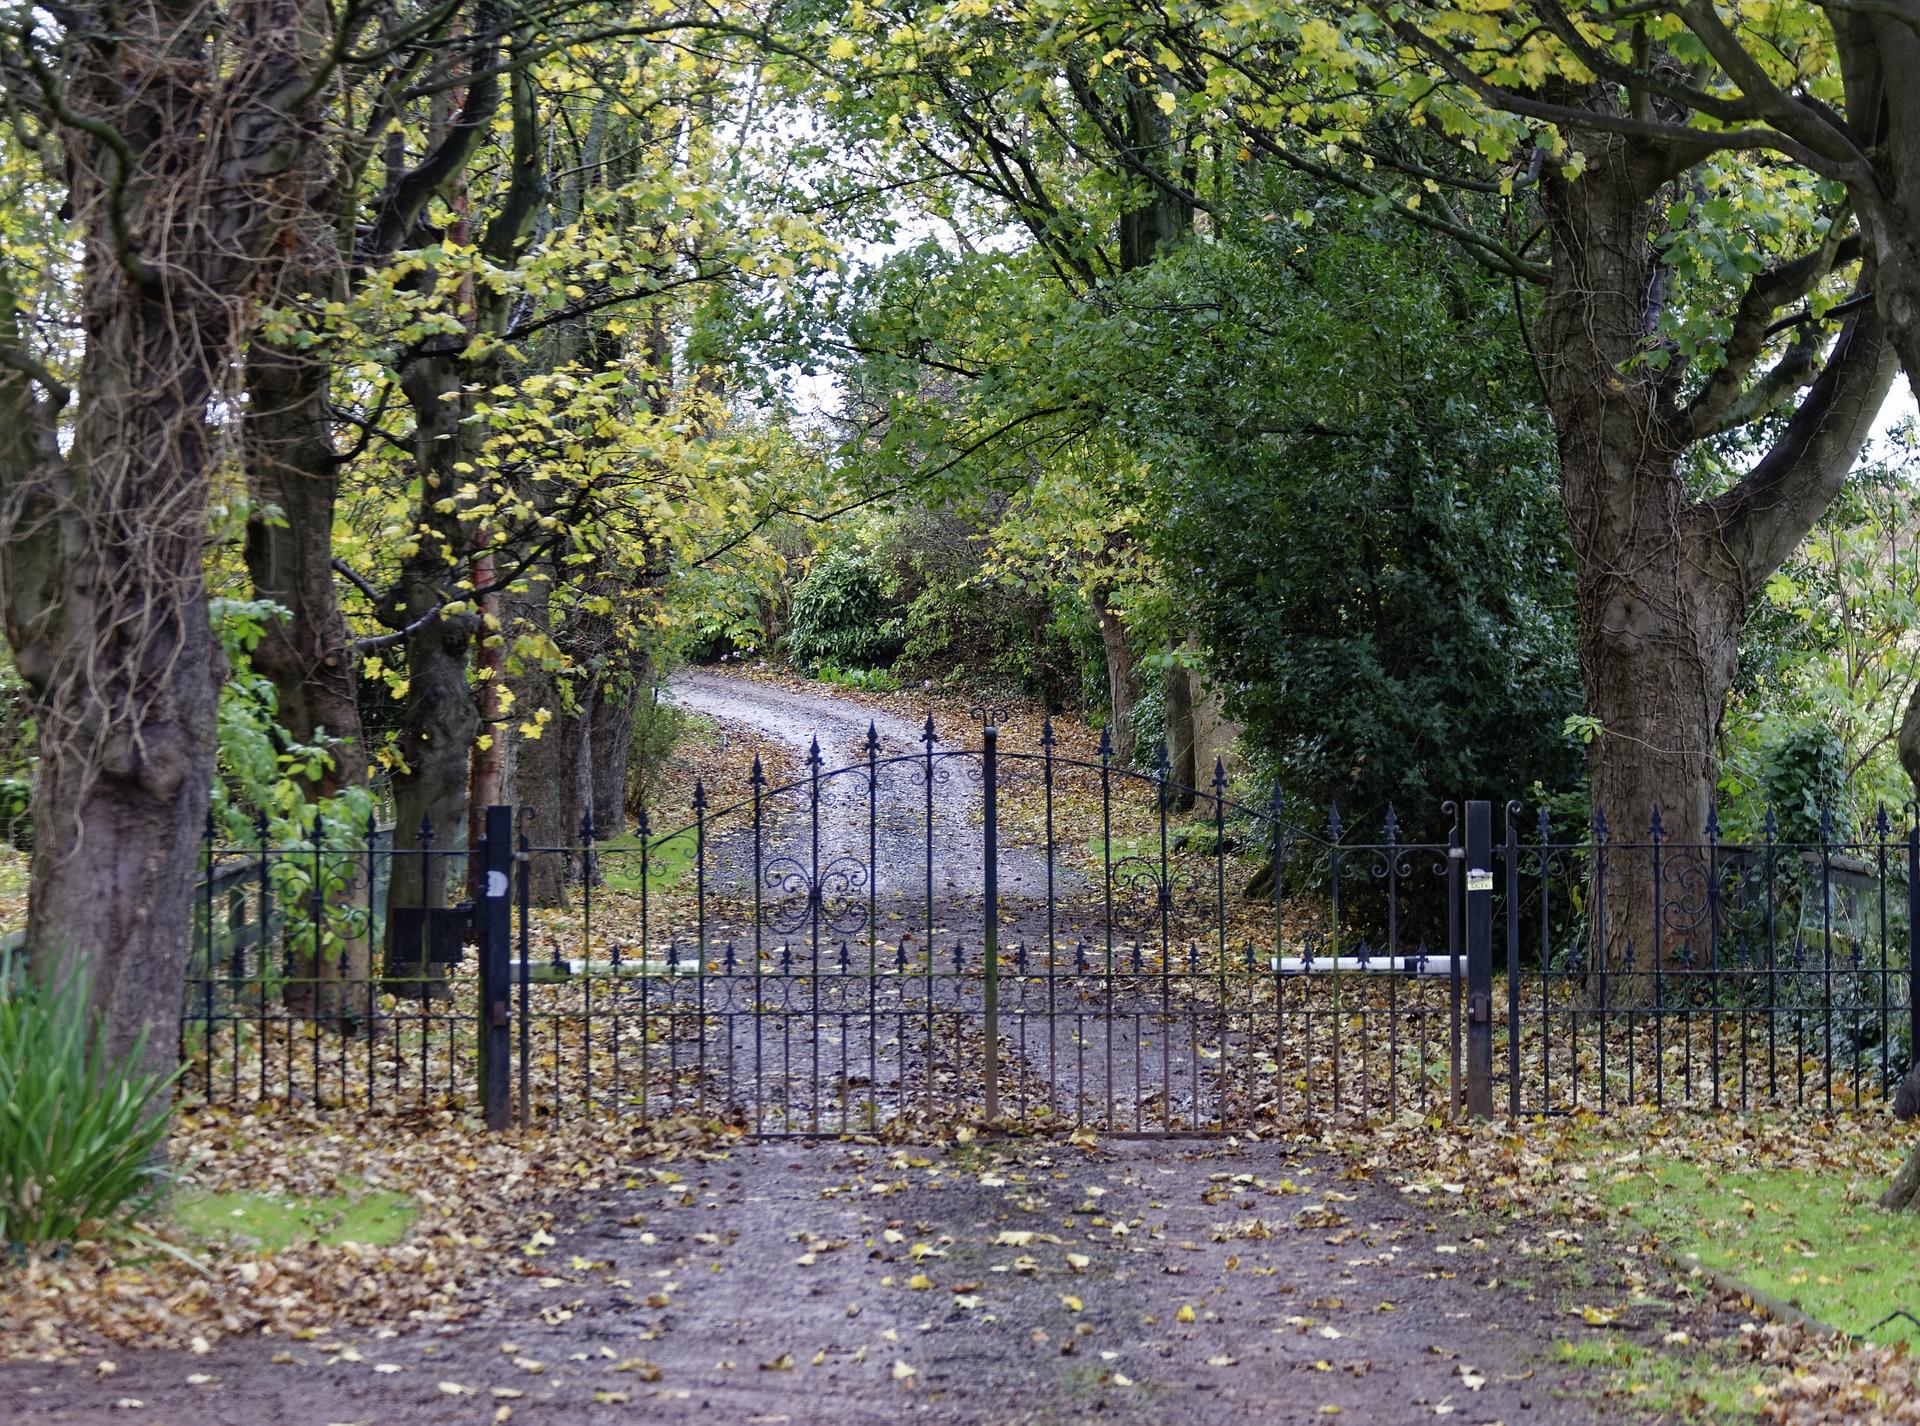 Driveways - Gravel vs Asphalt